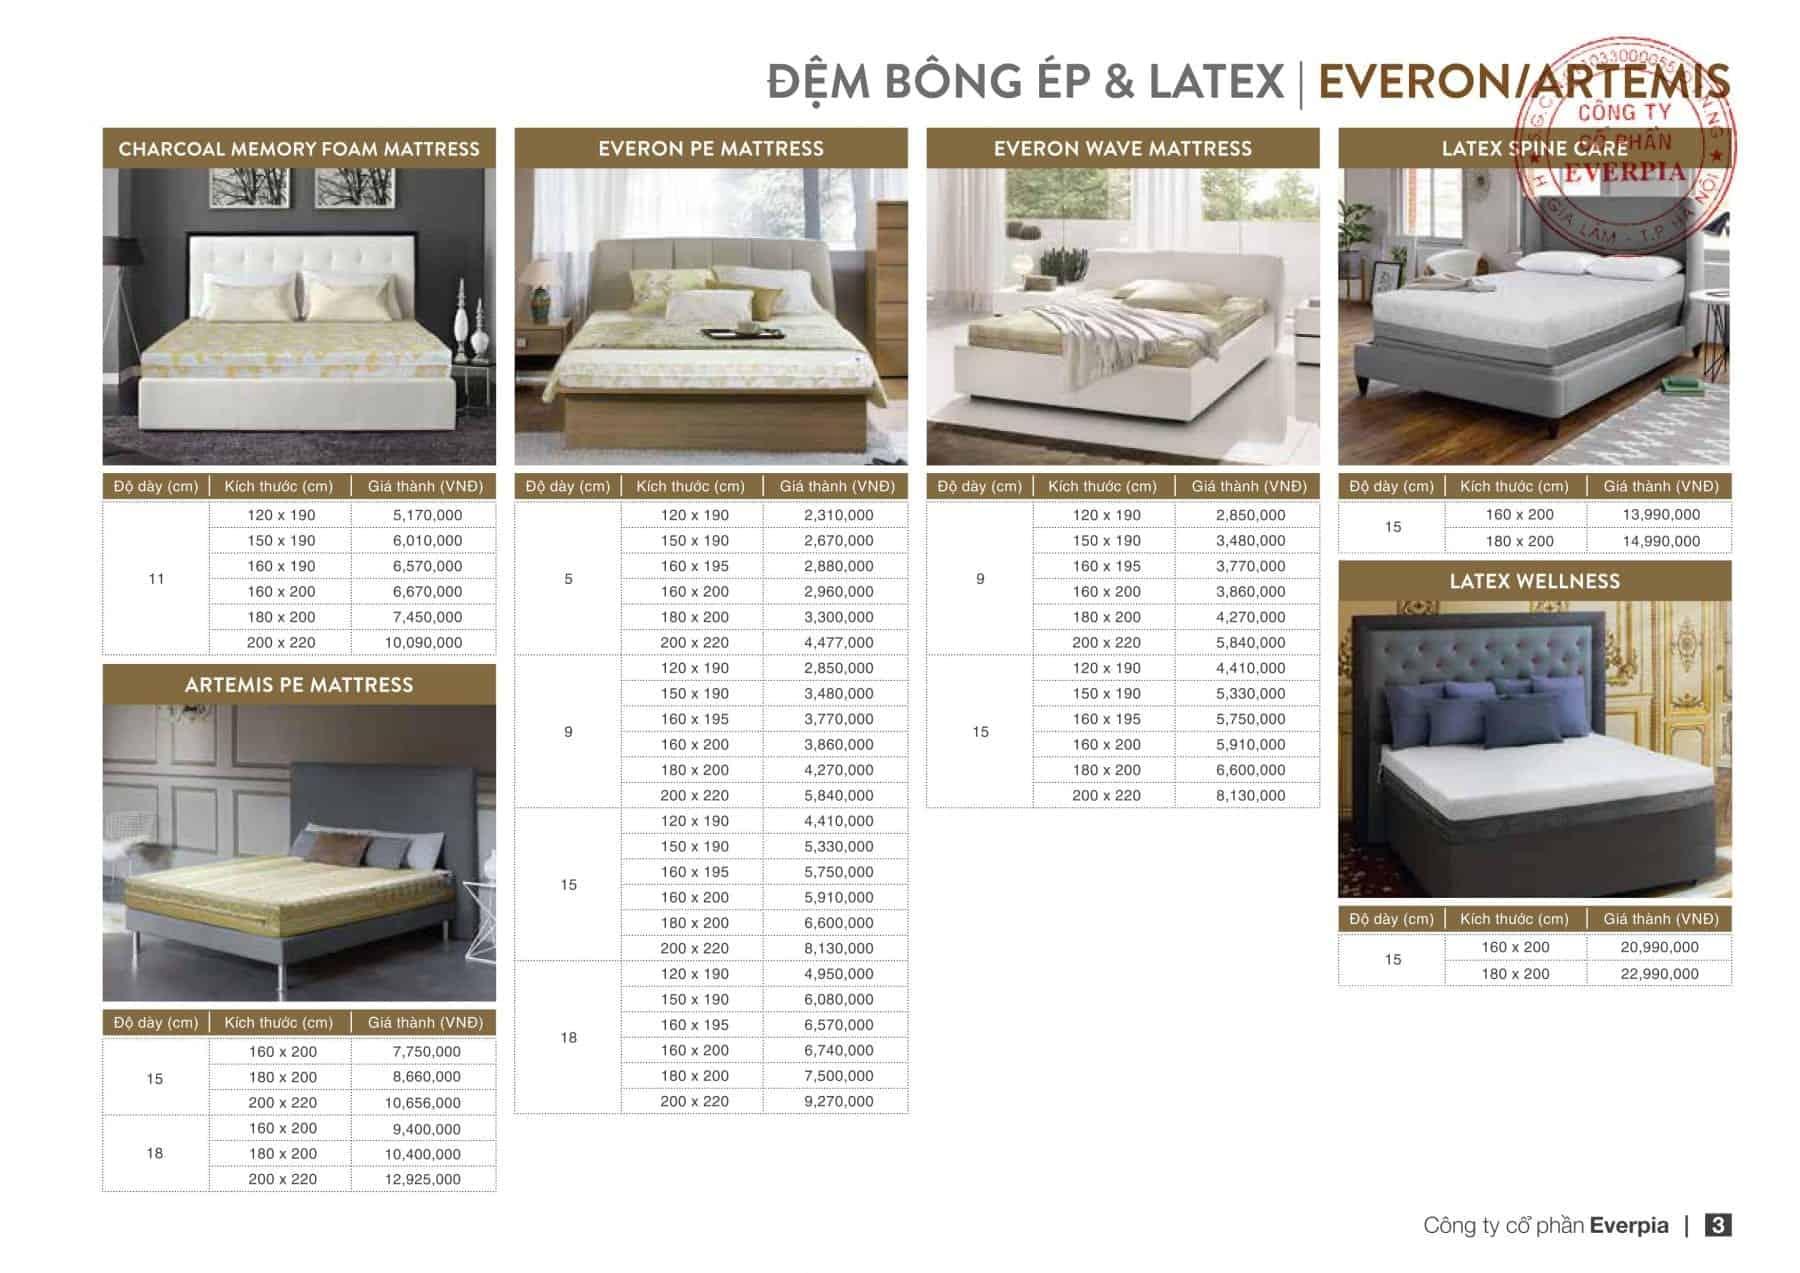 Bảng giá đệm Everon 2019 1